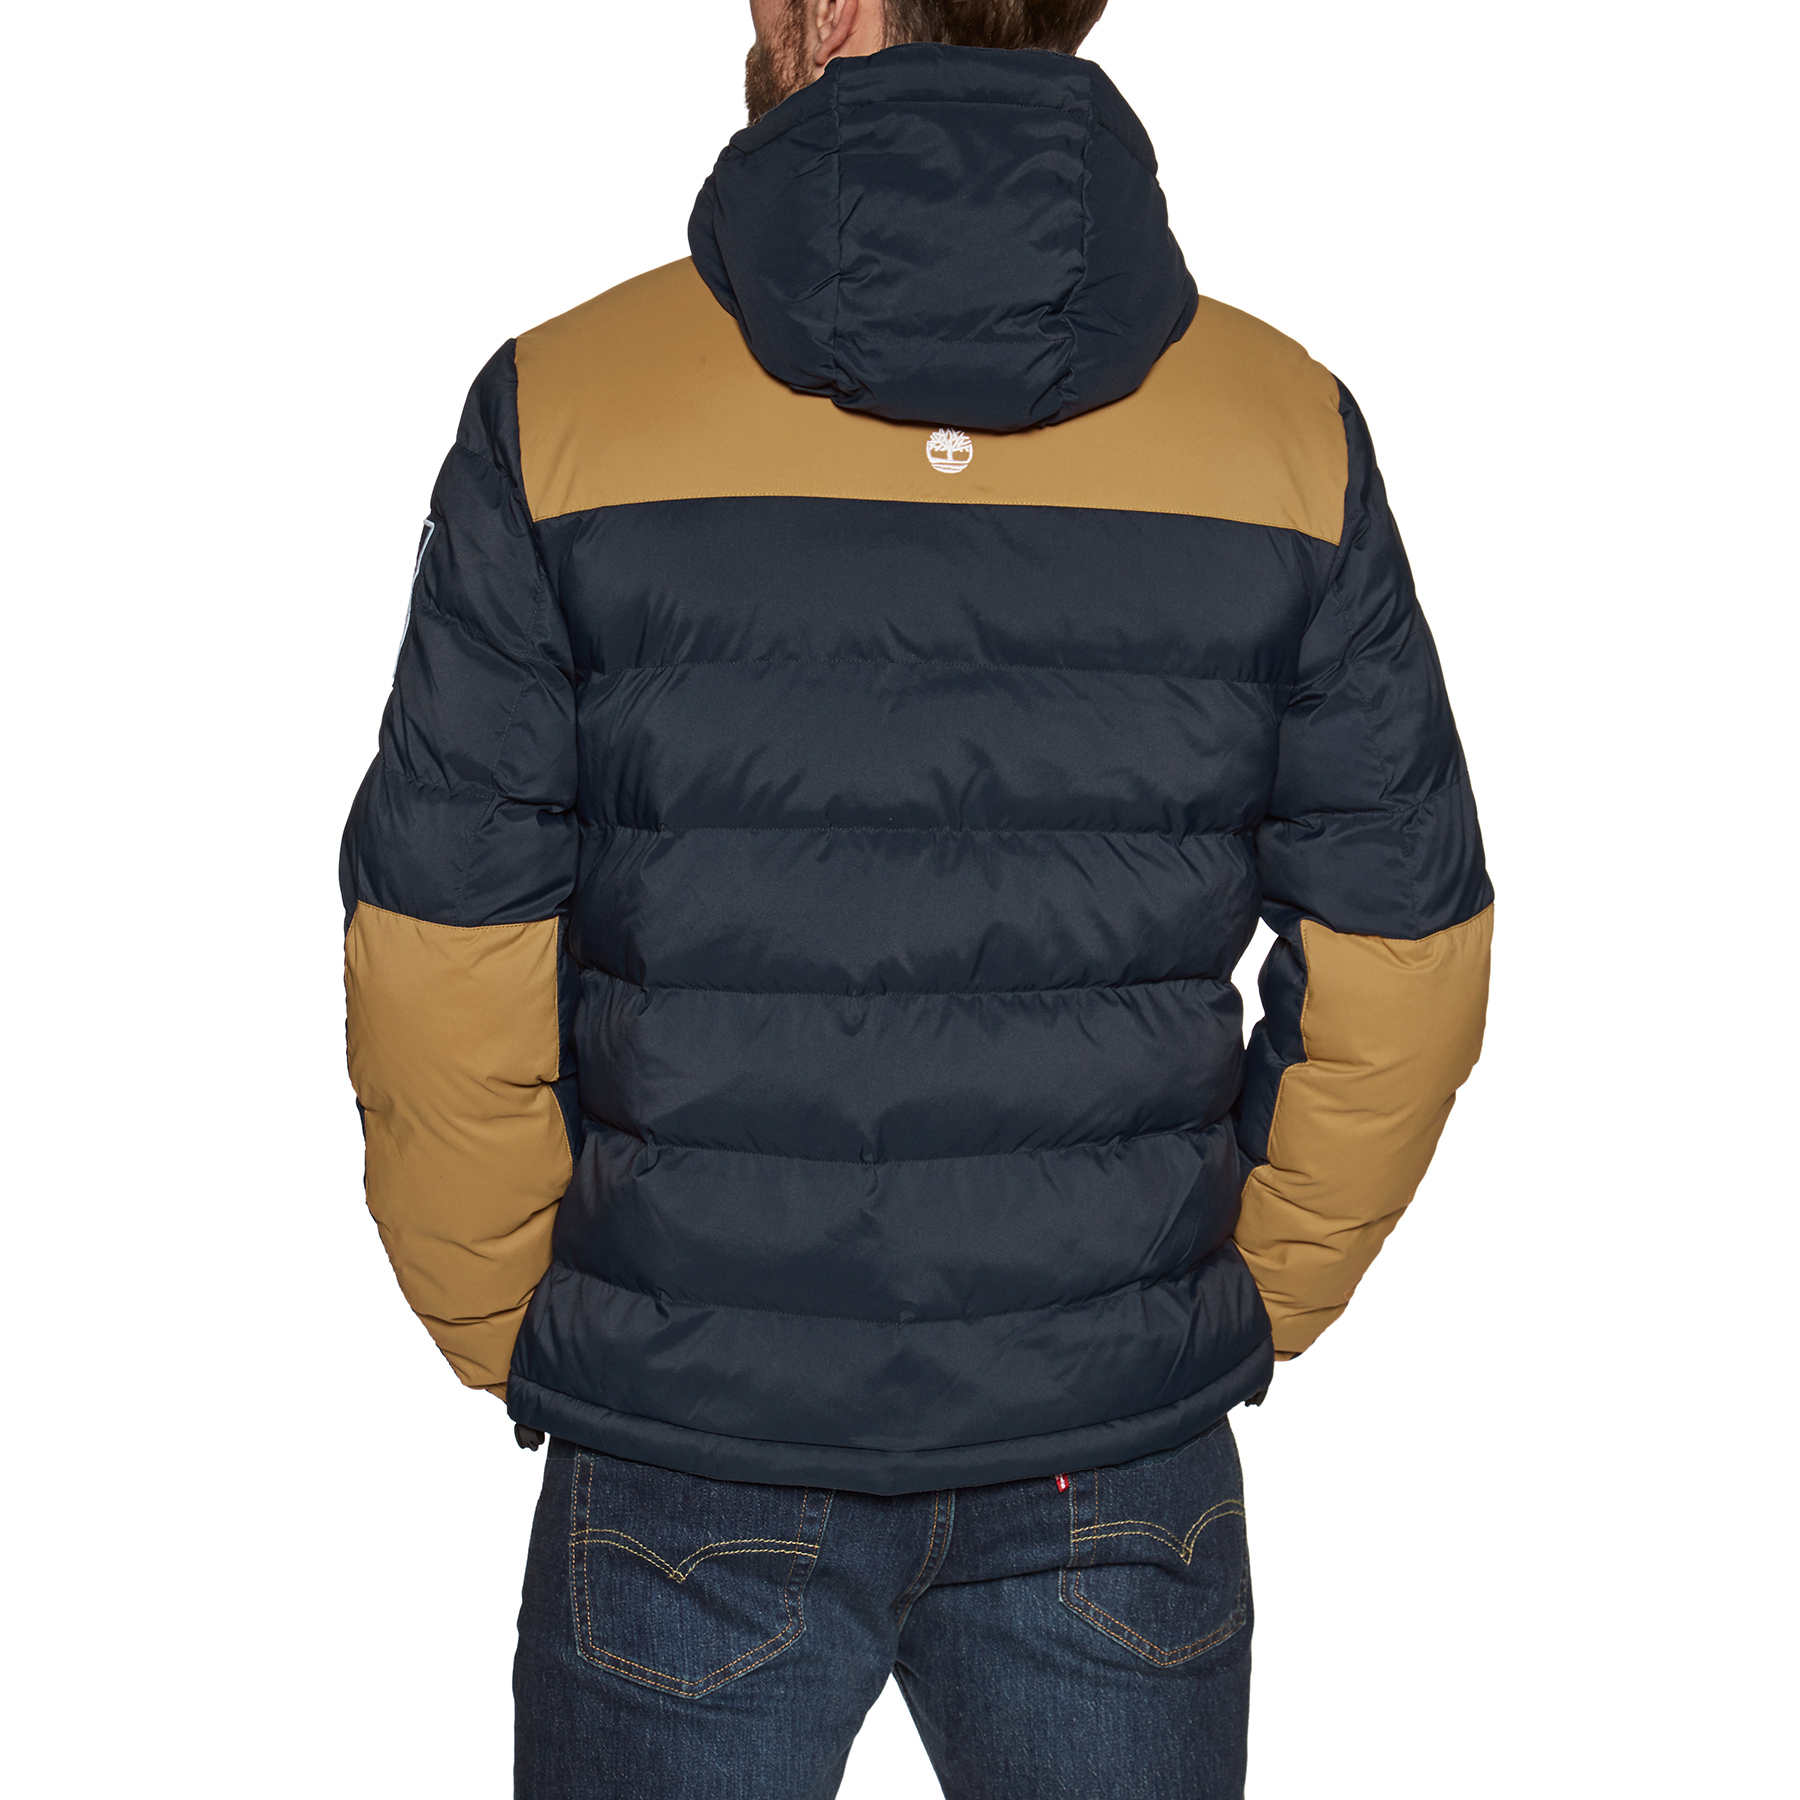 Timberland Outdoor Archive Puffer Jacke | Kostenlose